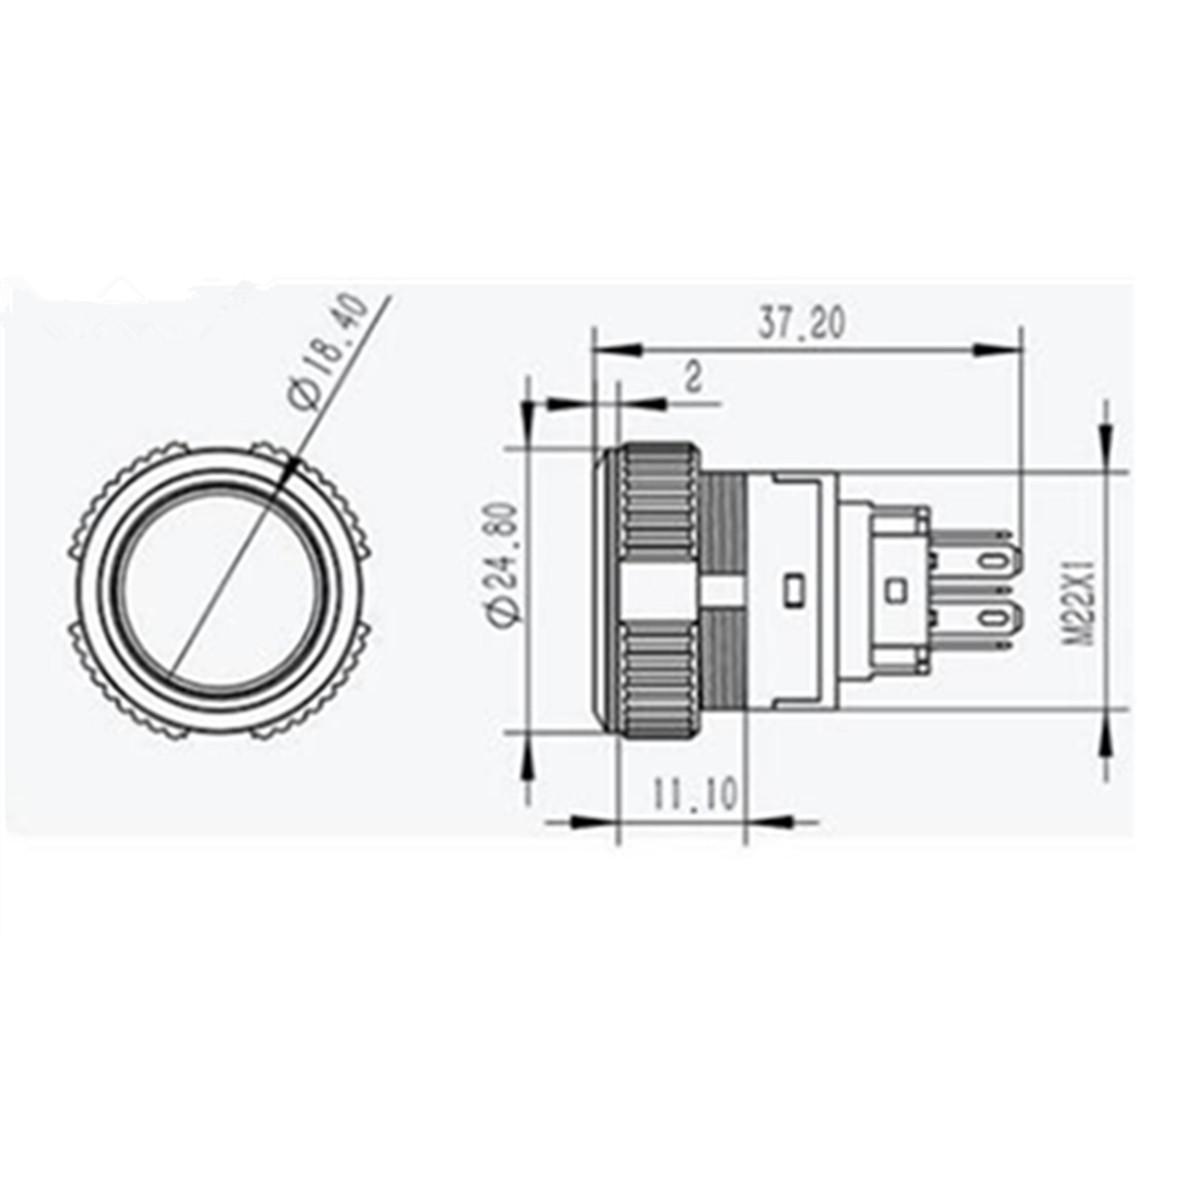 Original 12v 5 Pin Led Push Button Switch Plastic Lamp Car